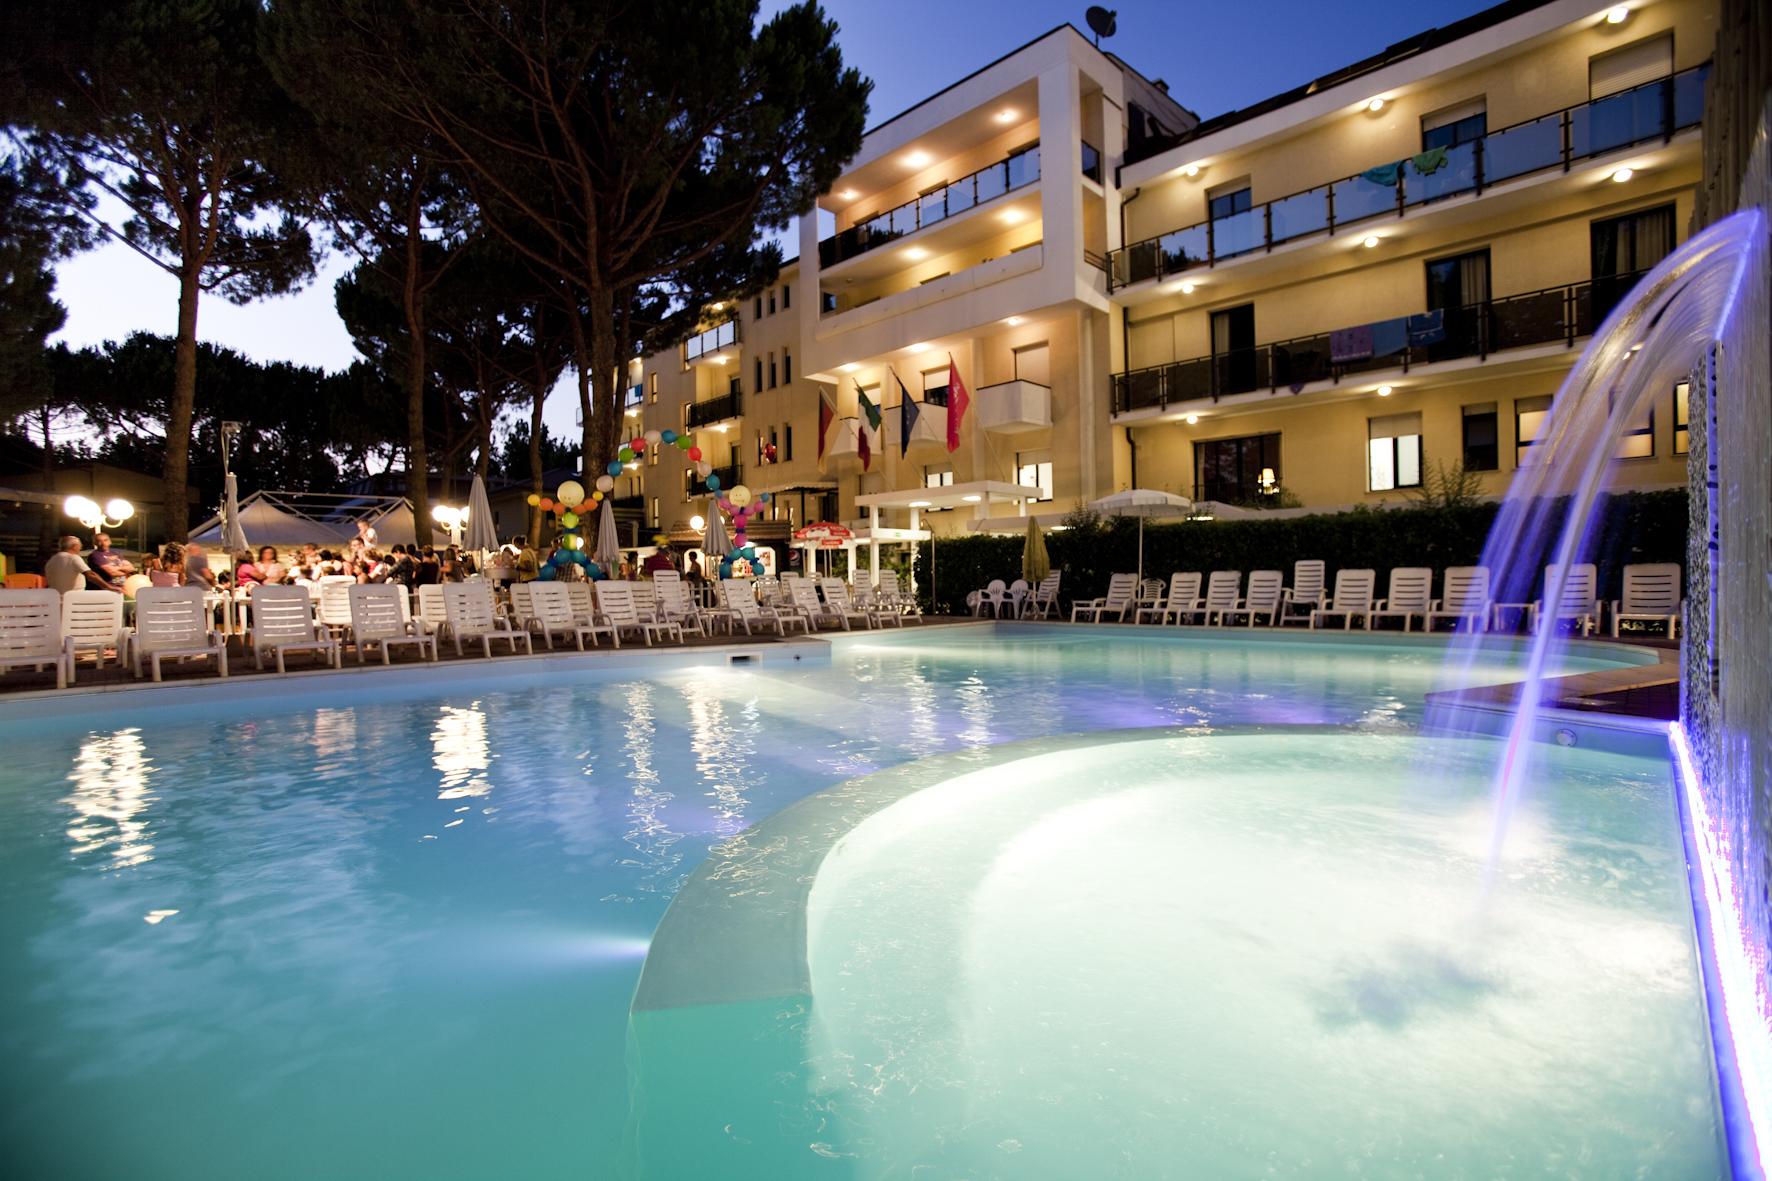 piscina riscaldata hotel club family